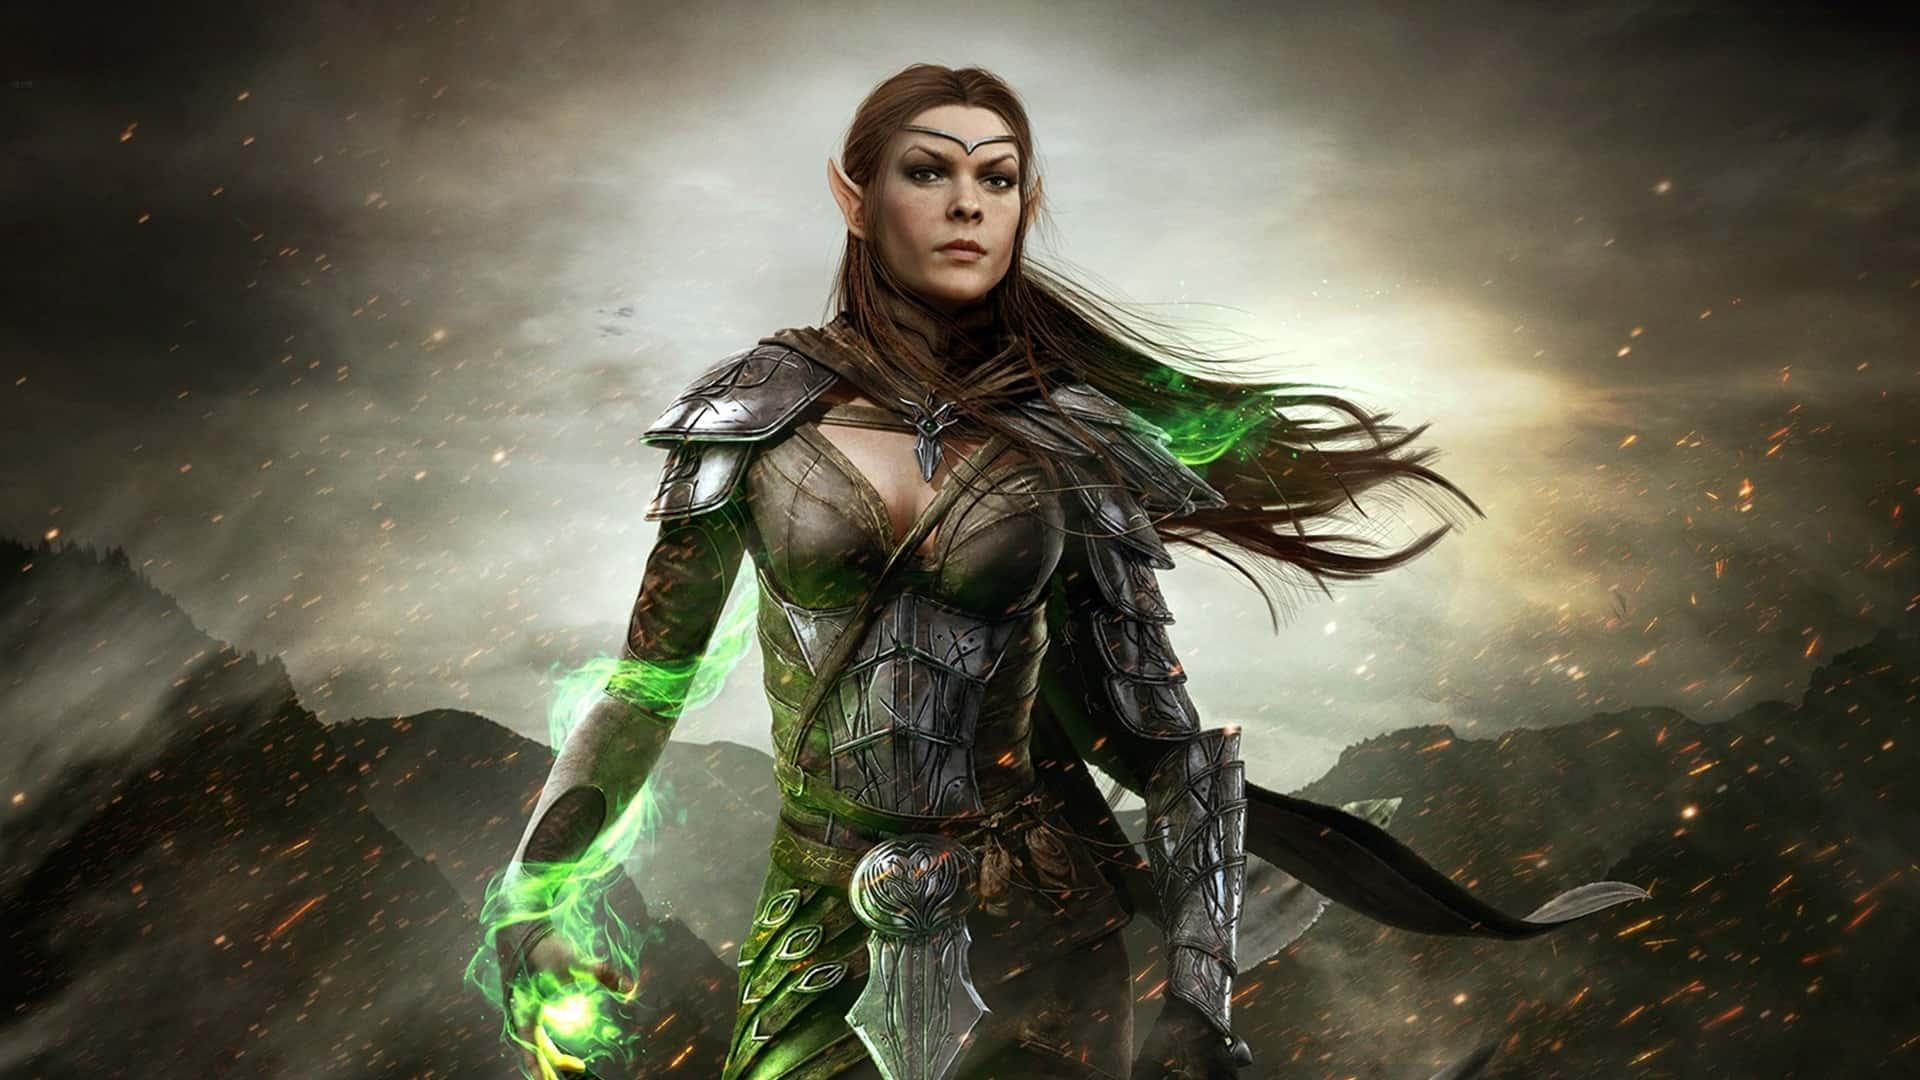 The Elder Scrolls III: Morrowind Now Backwards Compatible on Xbox One Today